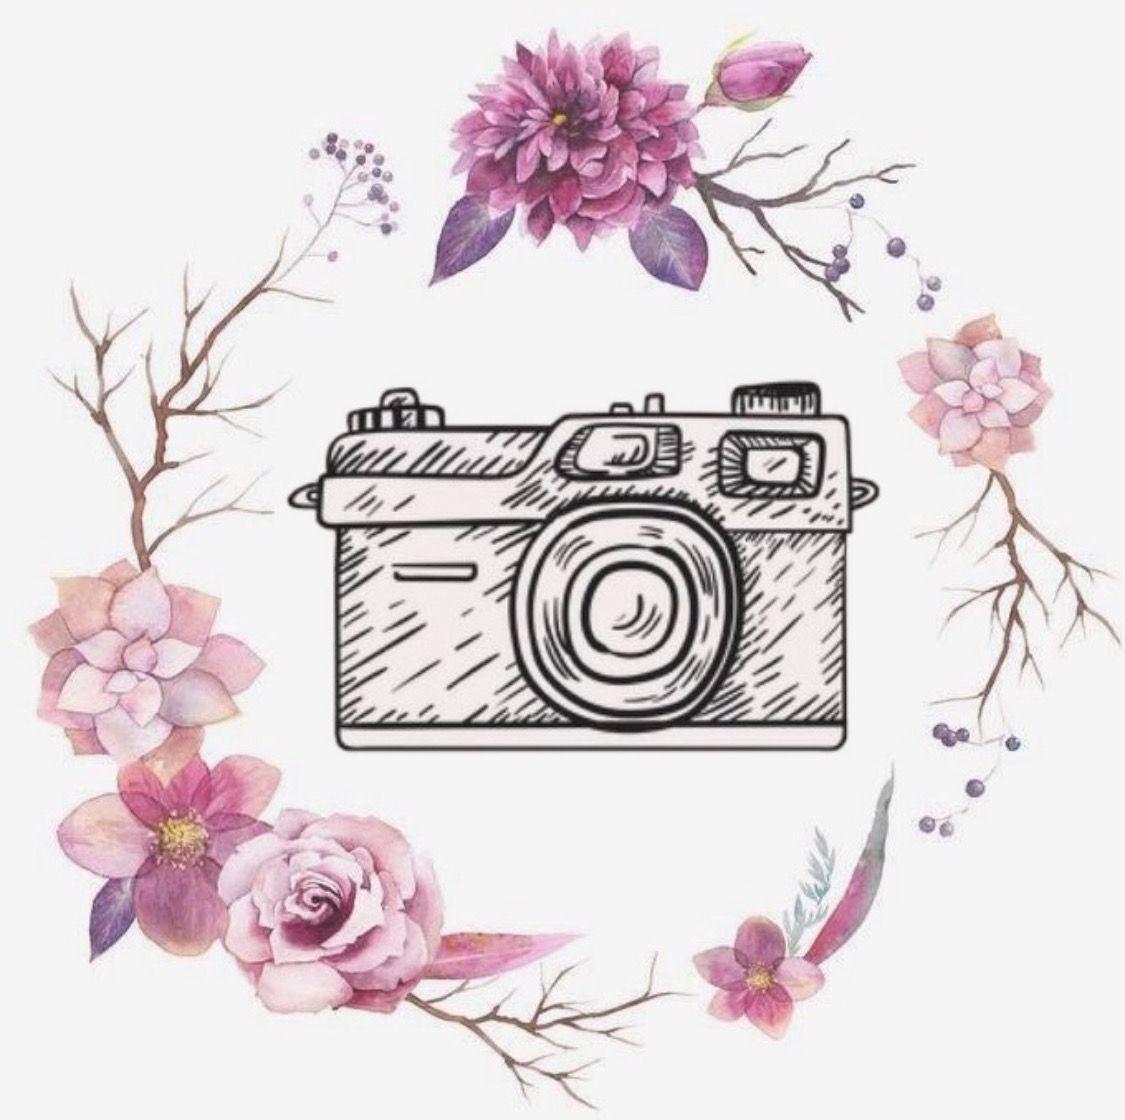 Pin De Nikele Silva Em ثيمات مناسبات Instagram Logotipo Instagram Icone Instagram